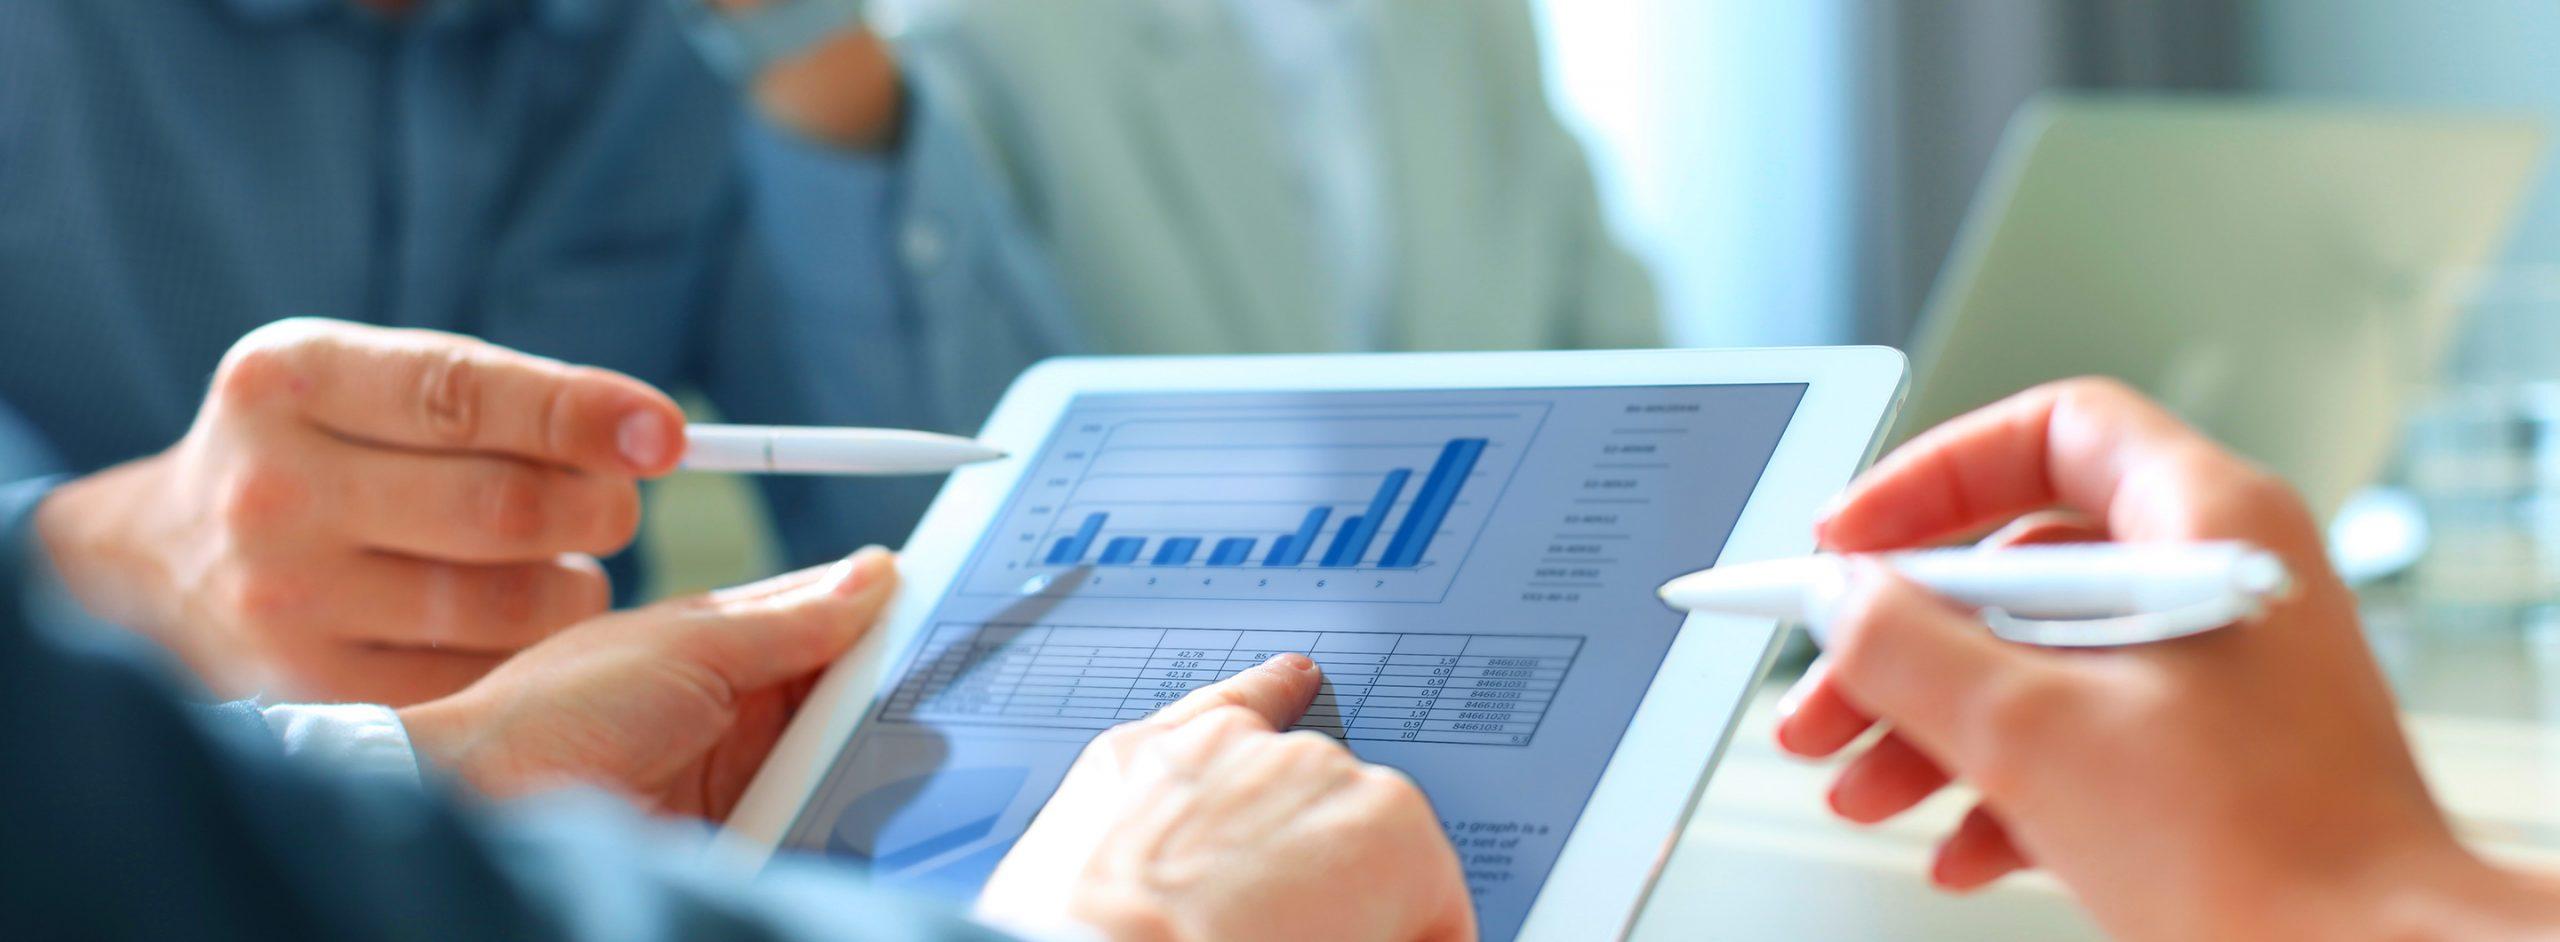 blog banner marketing analytics maturity-for-life-sciences